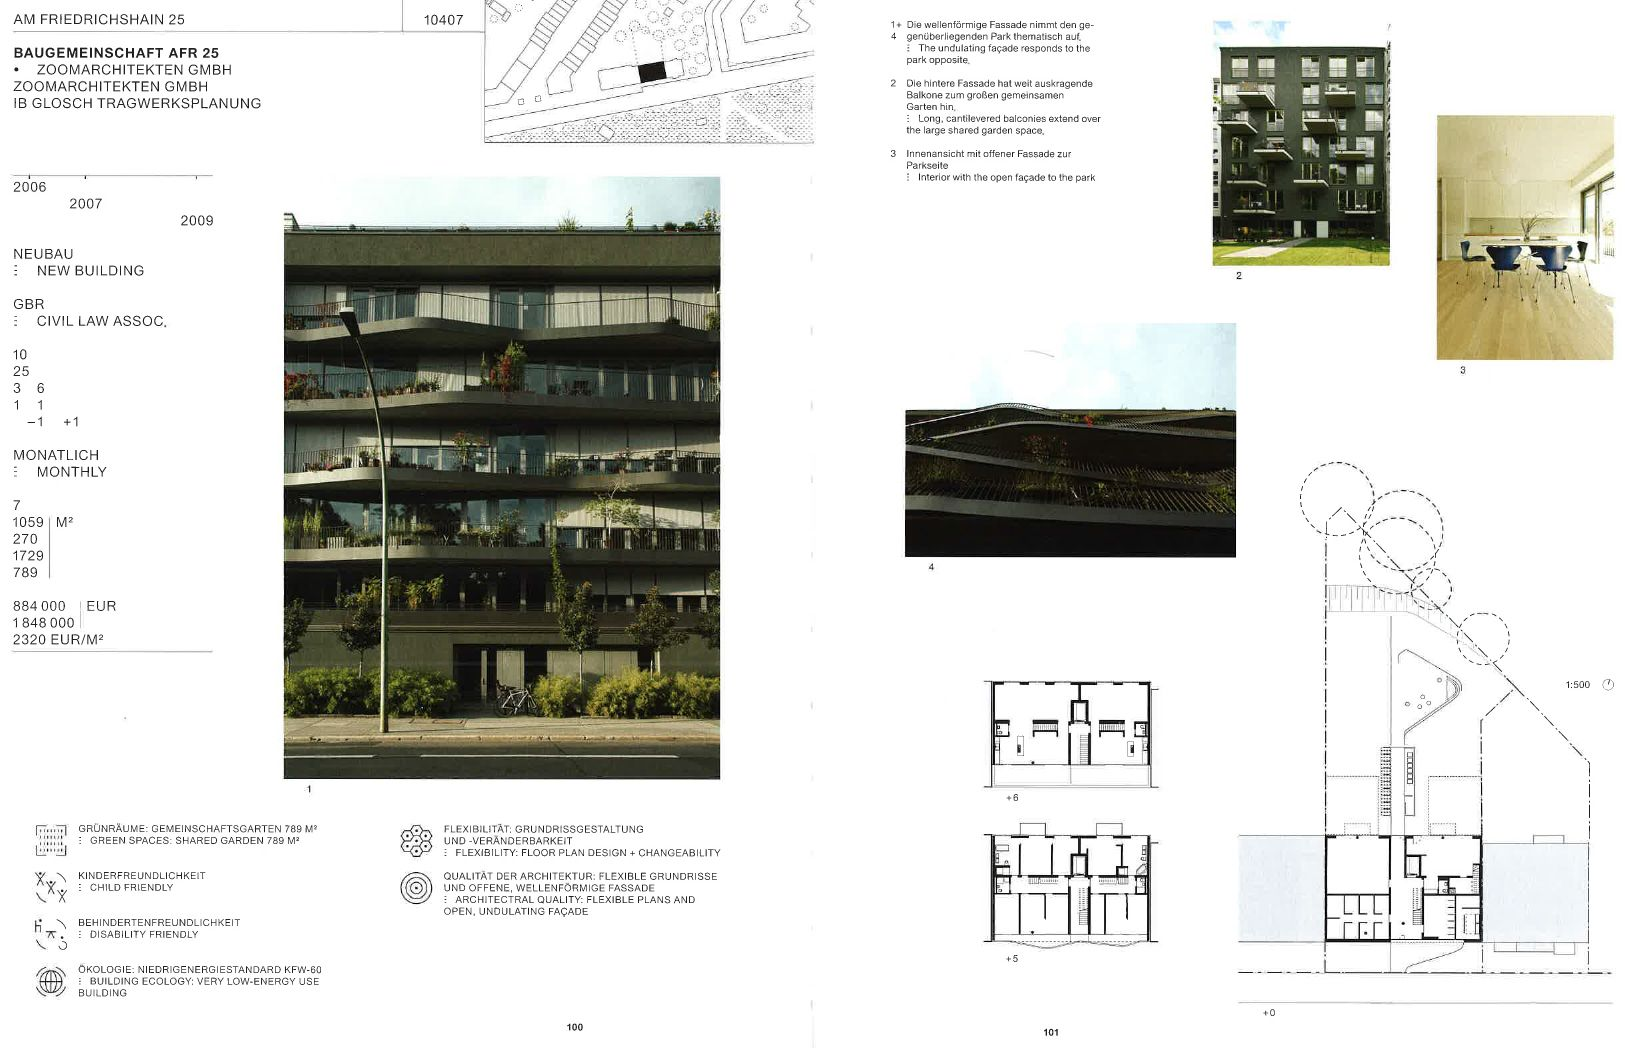 Baugemeinschaft AFR25, Zoomarchitekten, Berlin, DE